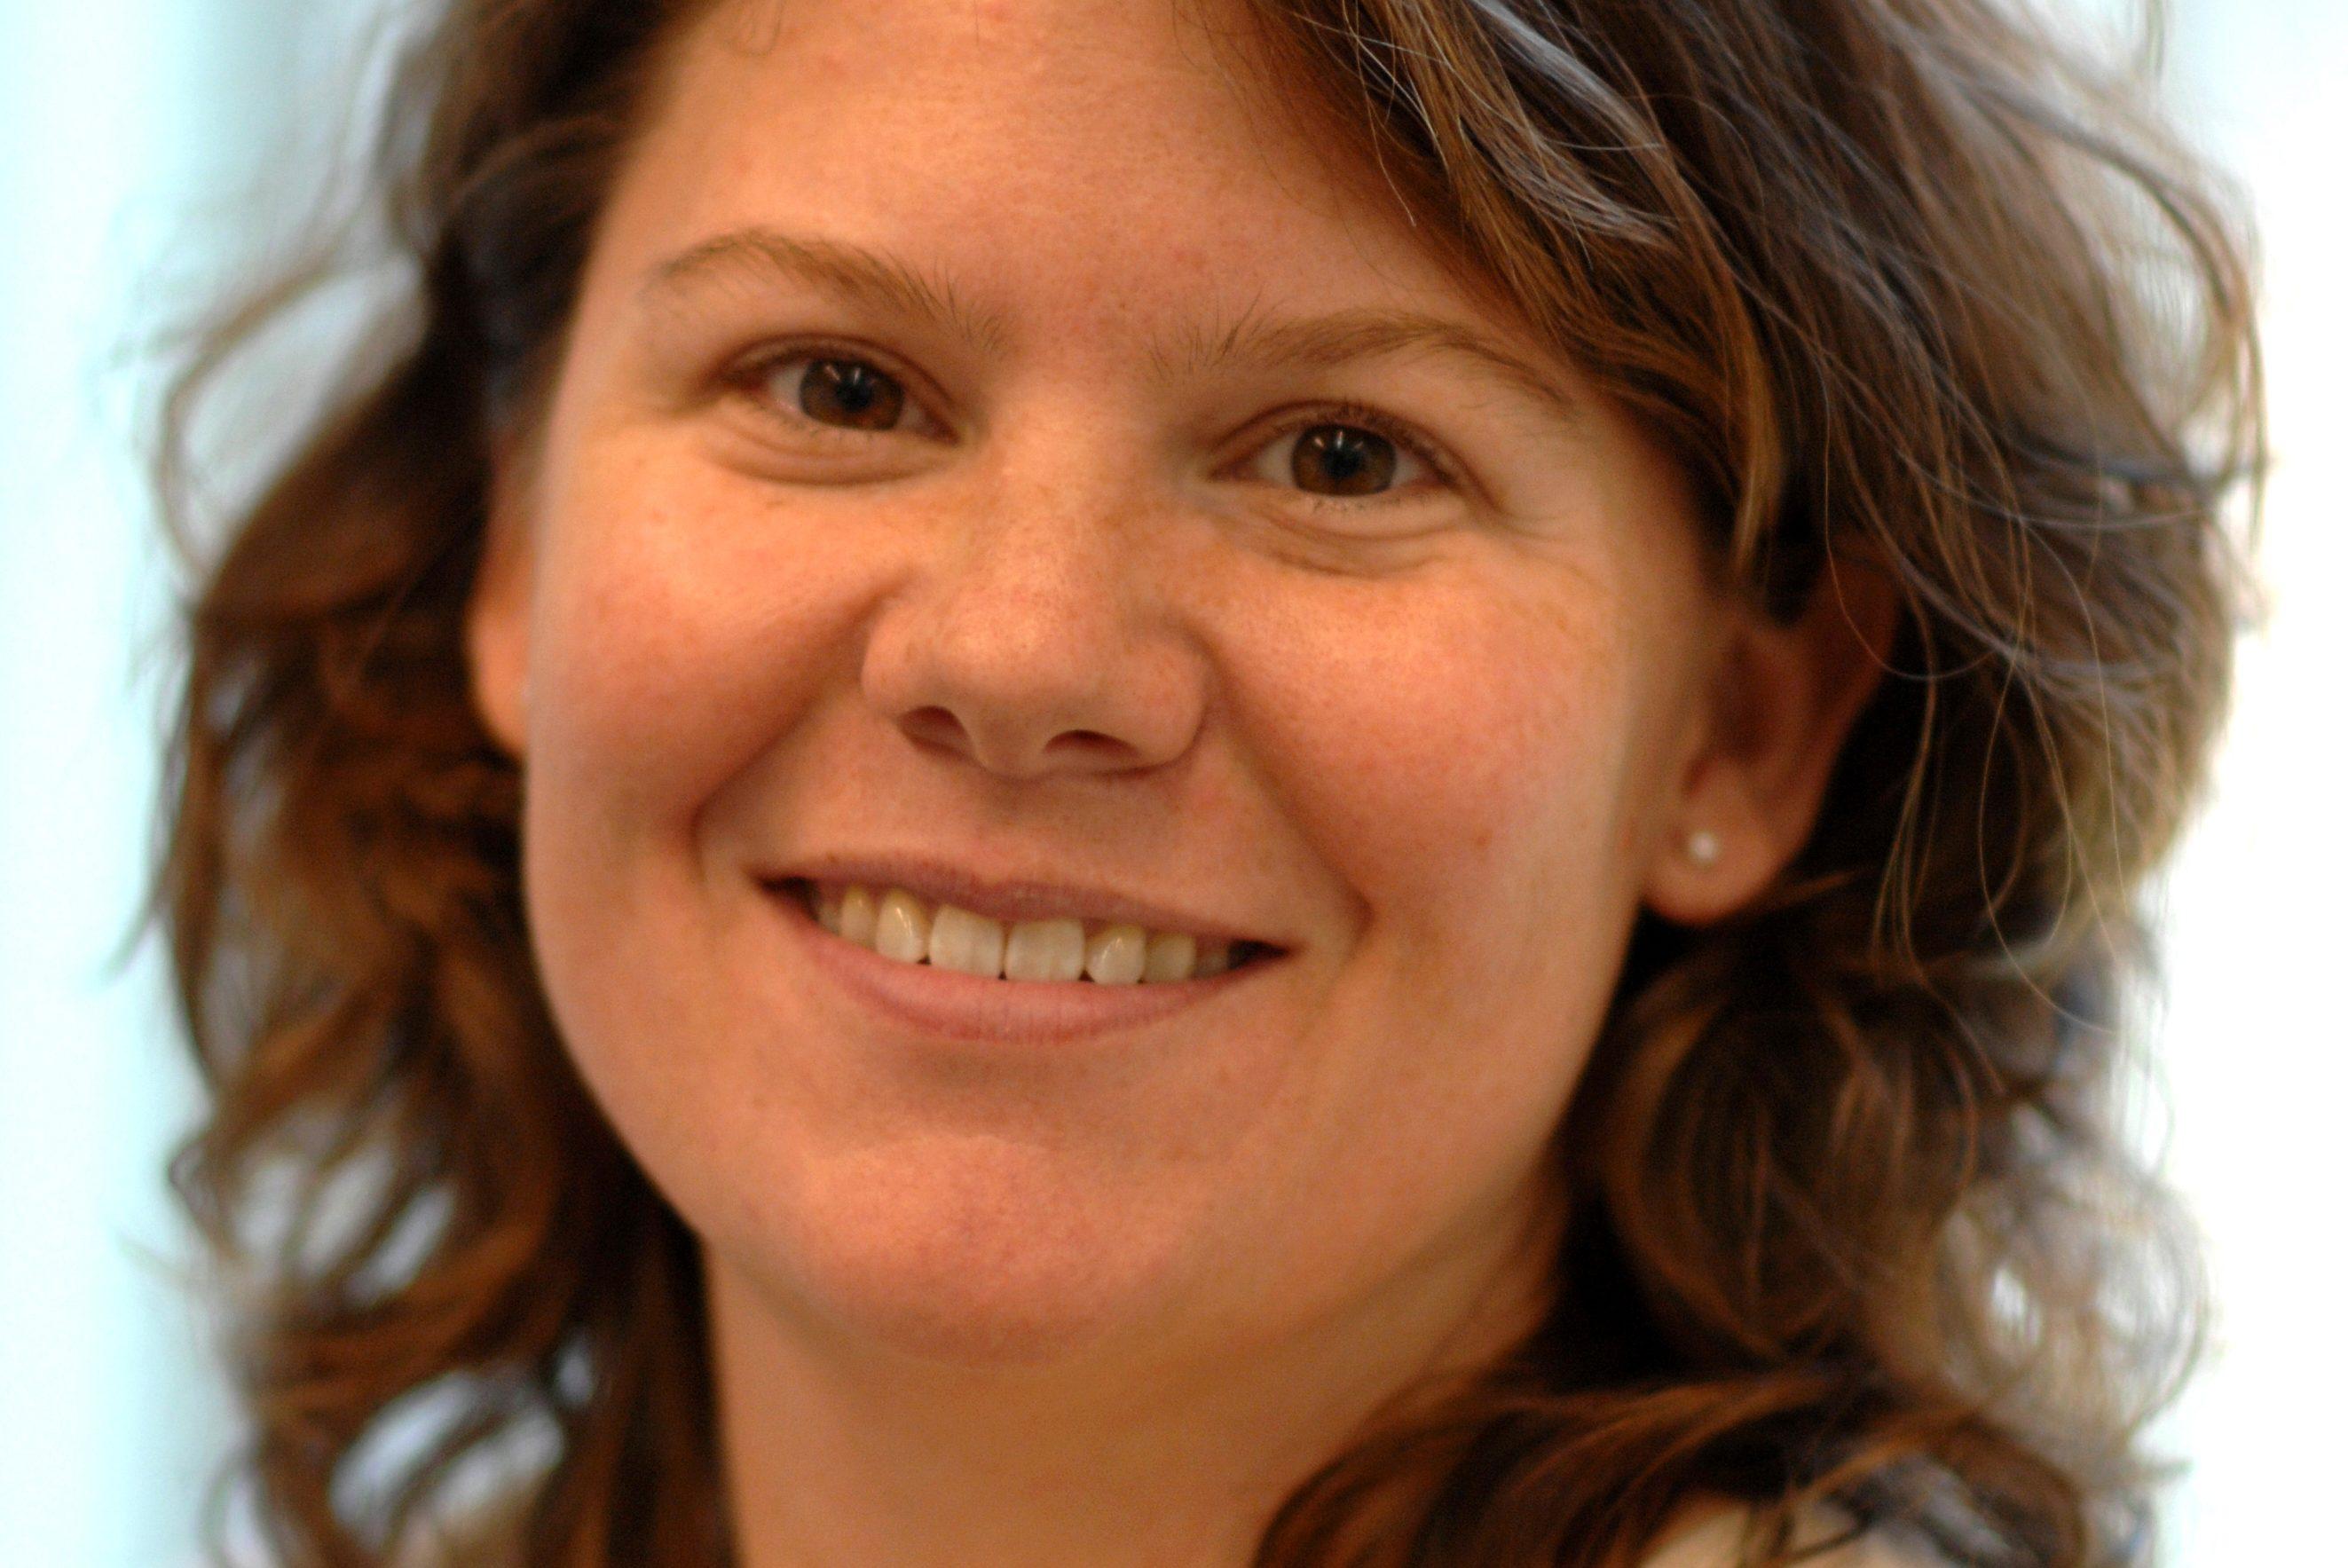 Heidi Rehm